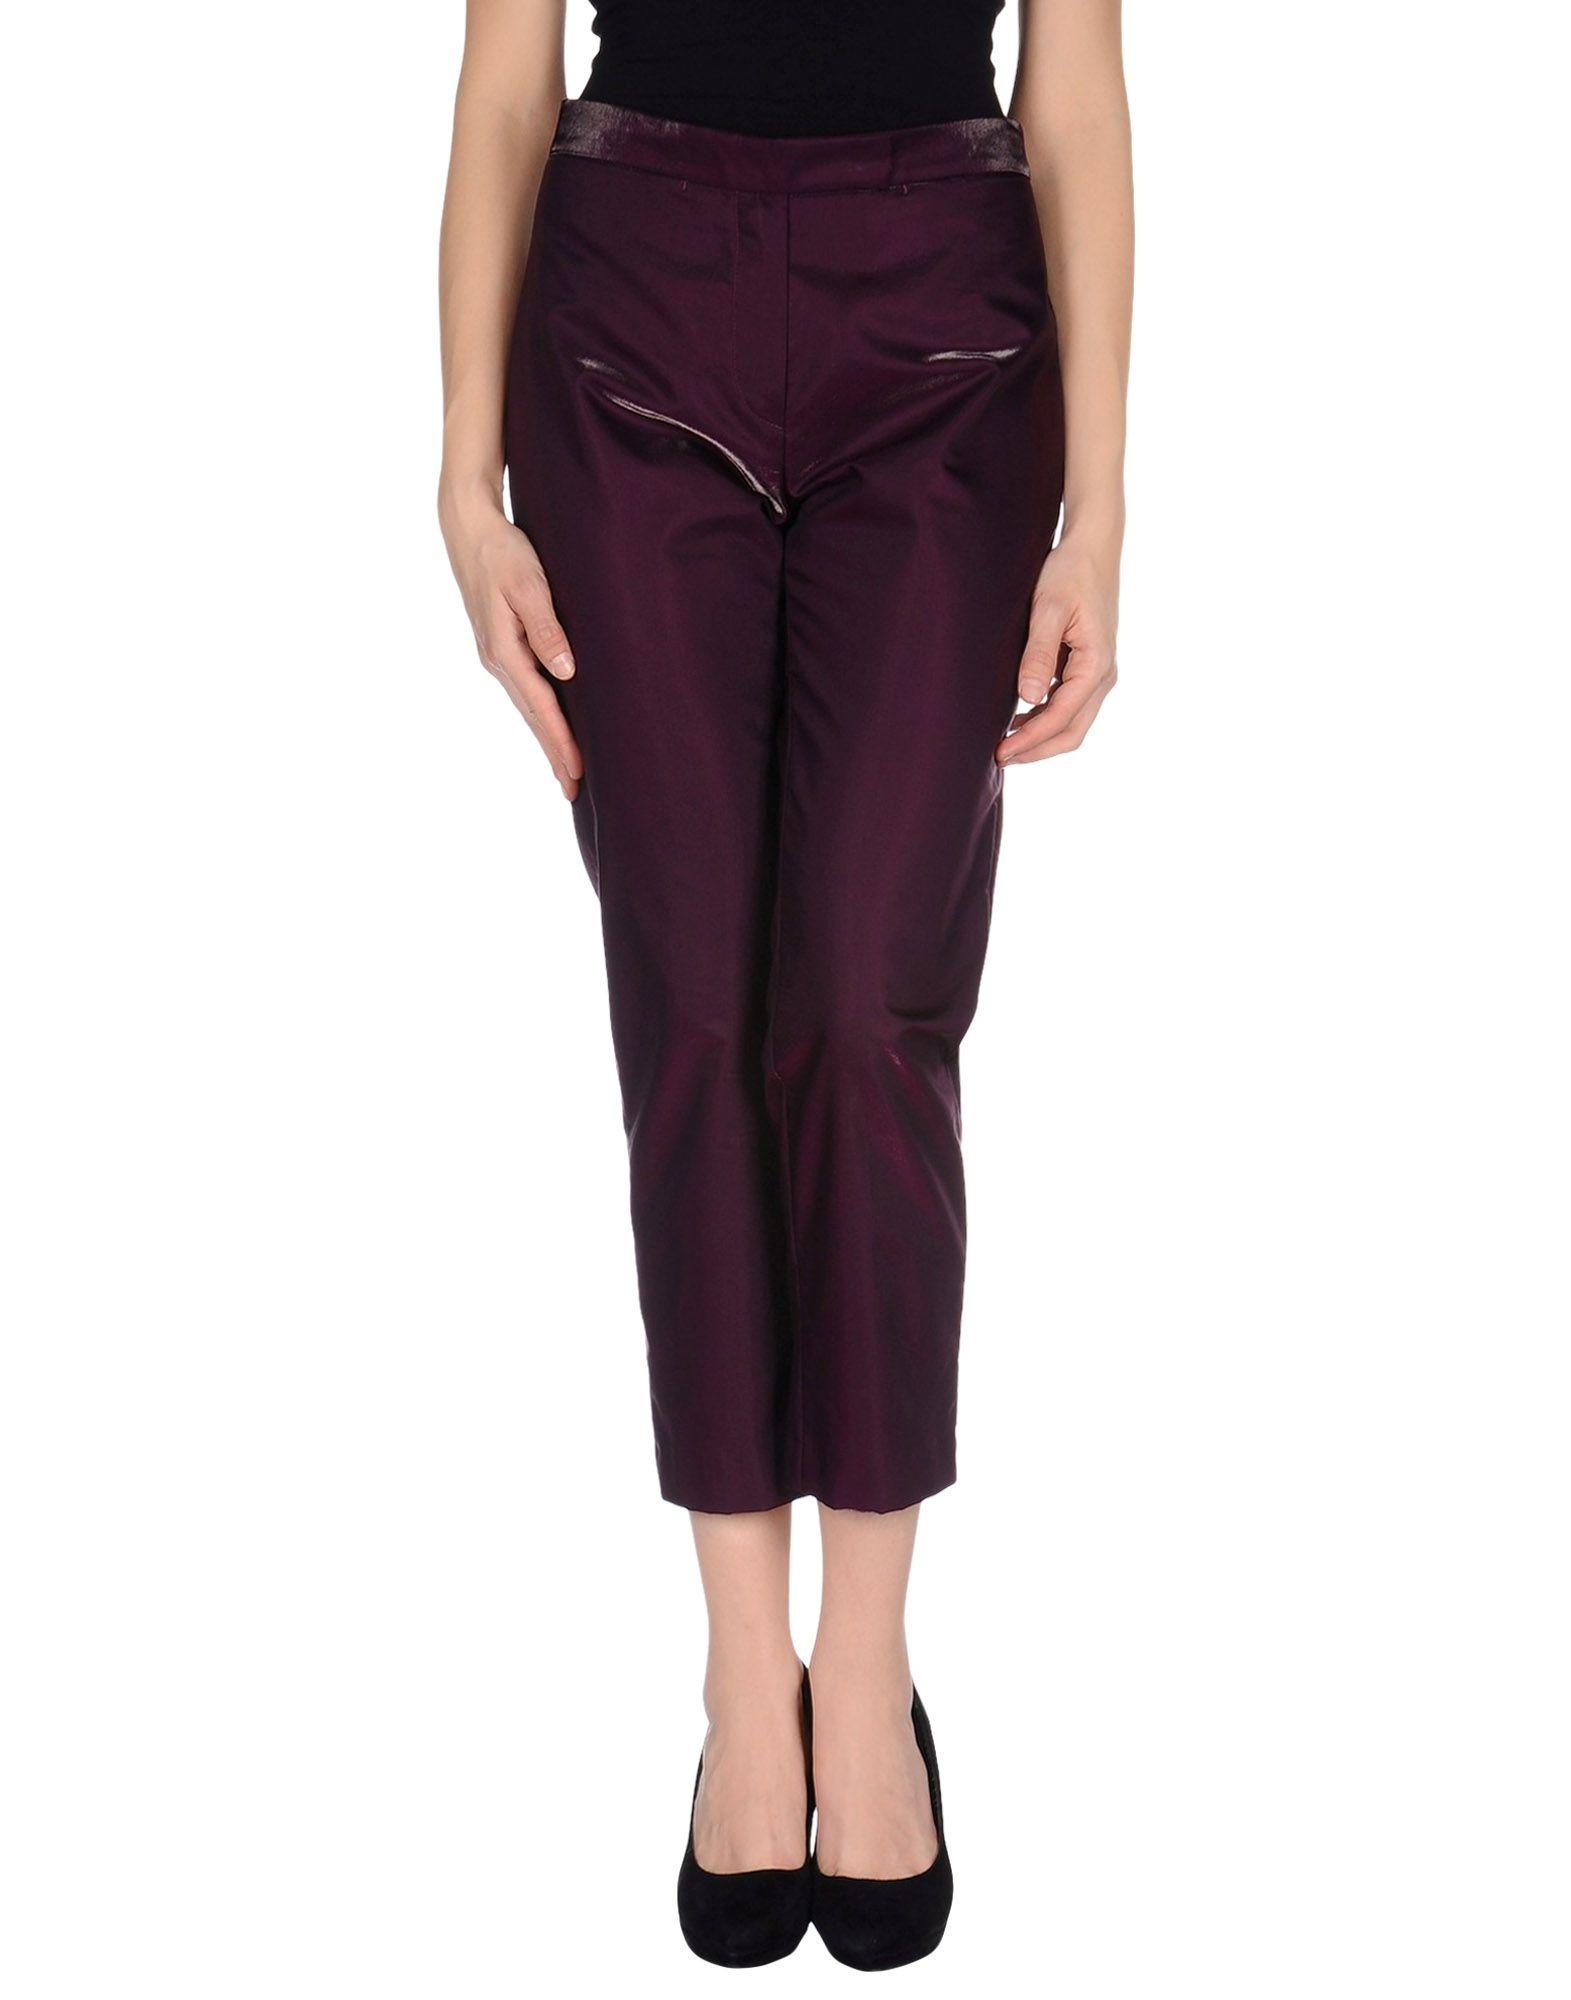 Ann Demeulemeester Casual Pants In Garnet